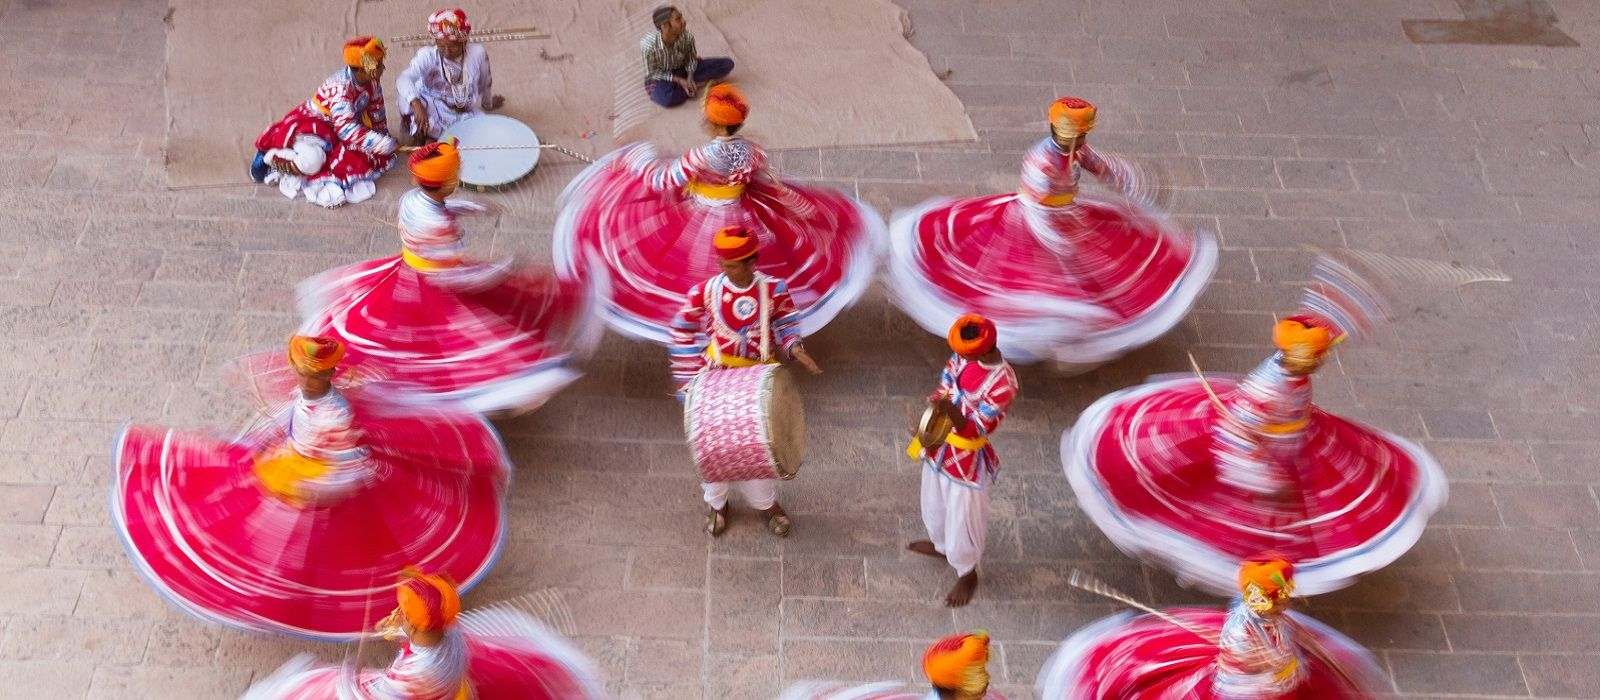 The Oberoi Hotels & Resorts Sommerangebot: Royales Rajasthan Urlaub 6